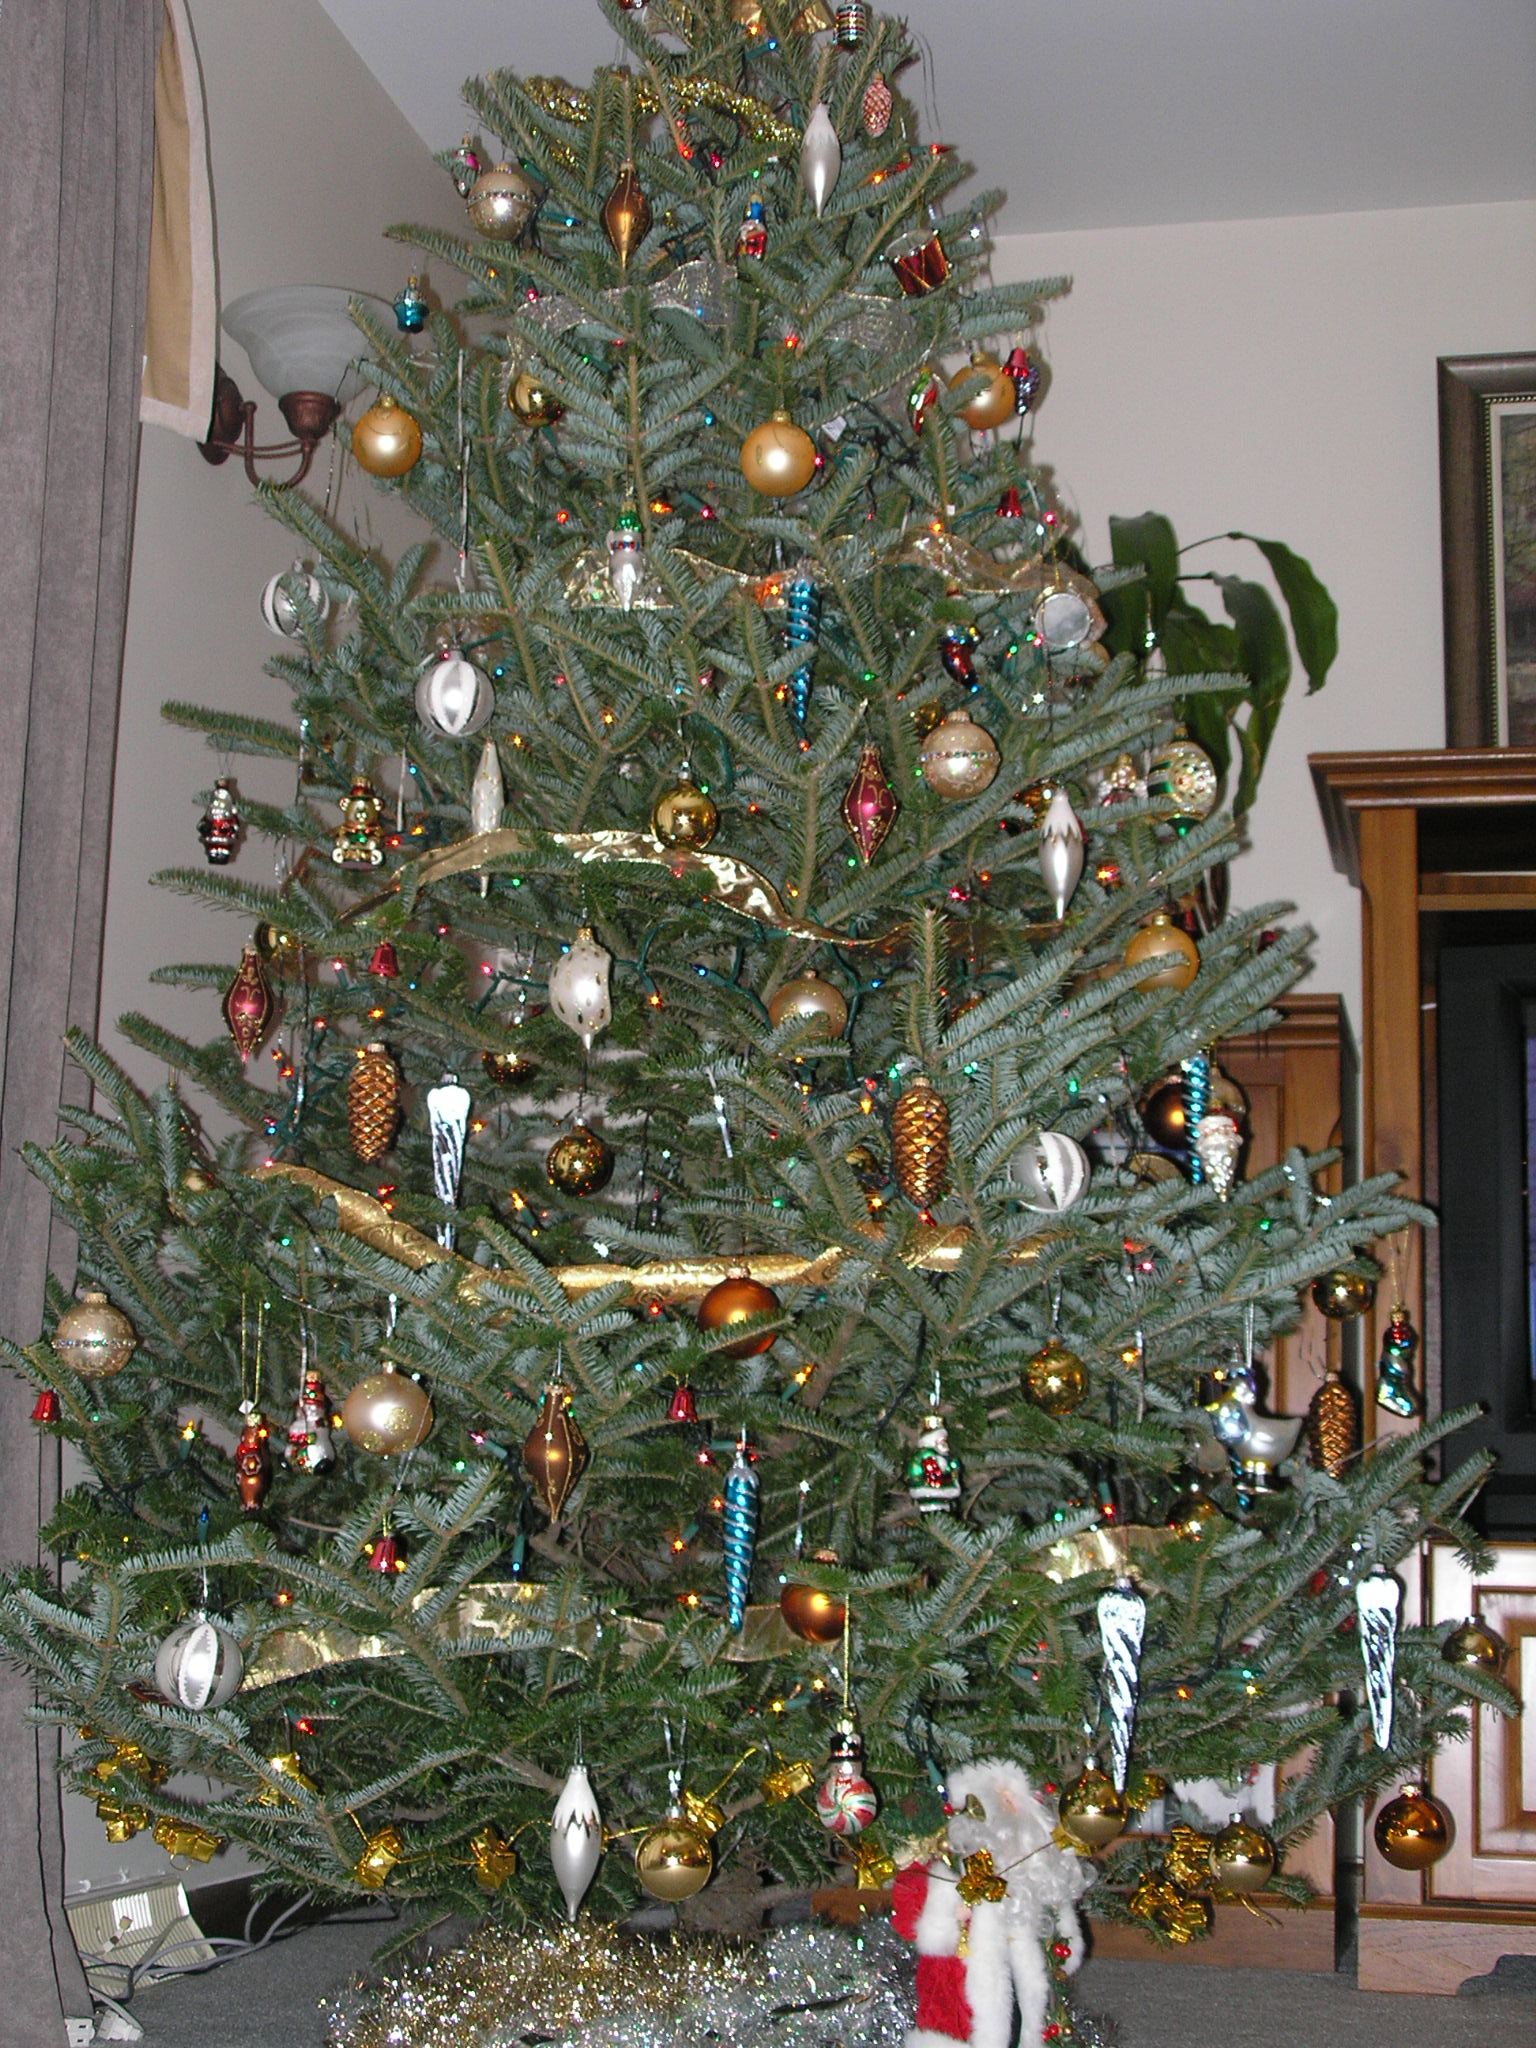 filechristmas tree ddimajpg